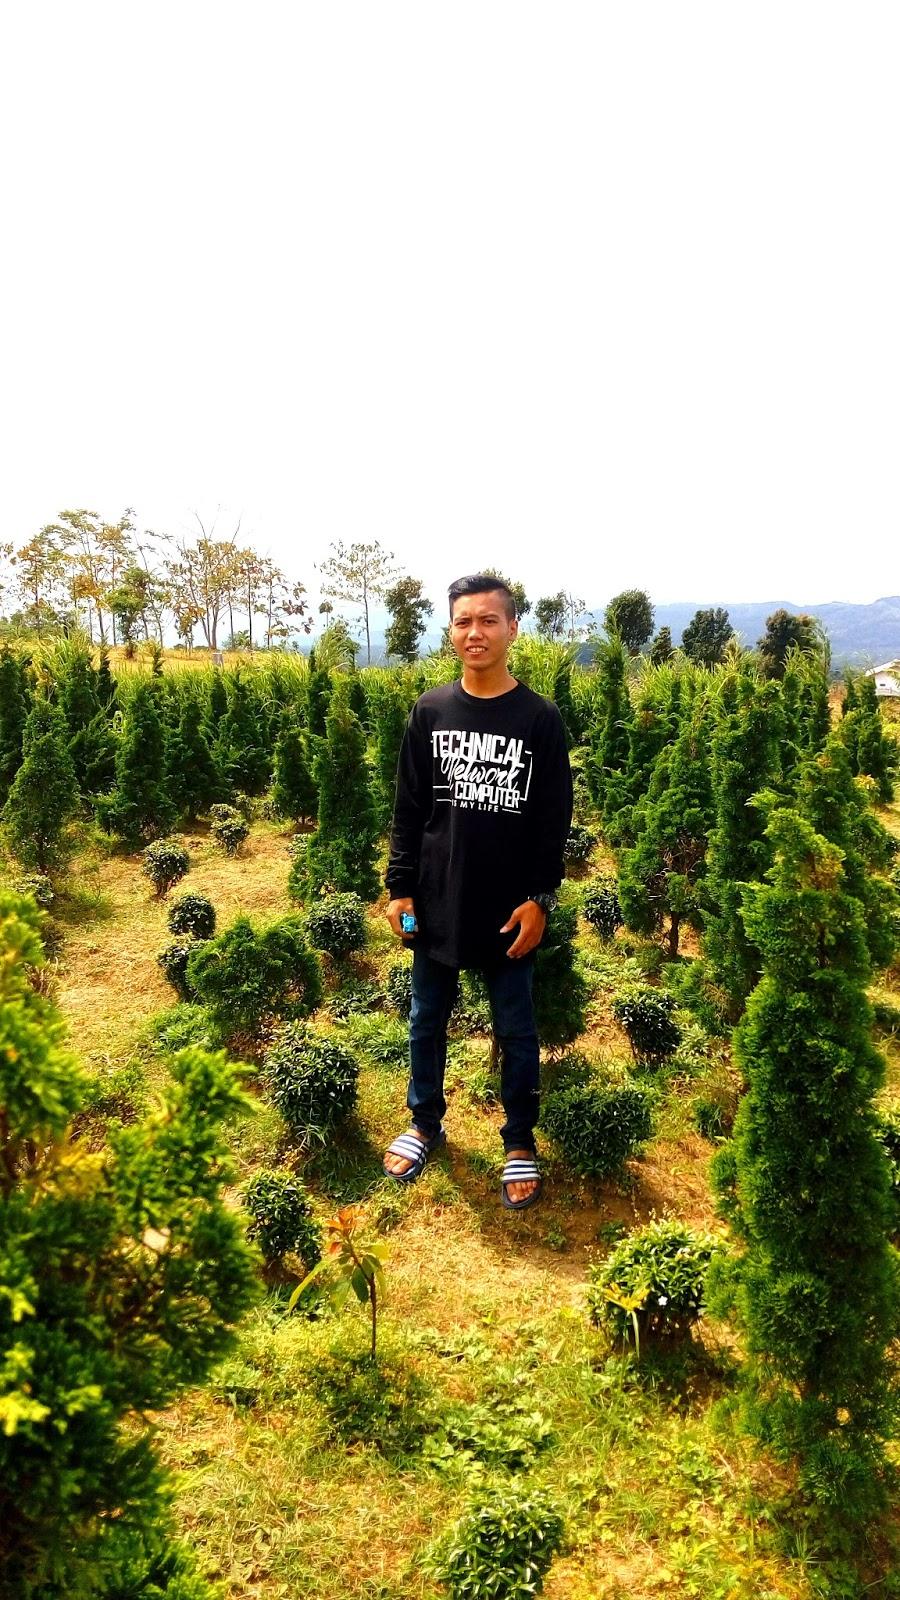 Jelajah Wisata Desa Geger Kecamatan Sendang Kab Tulungagung Prov Sebelum